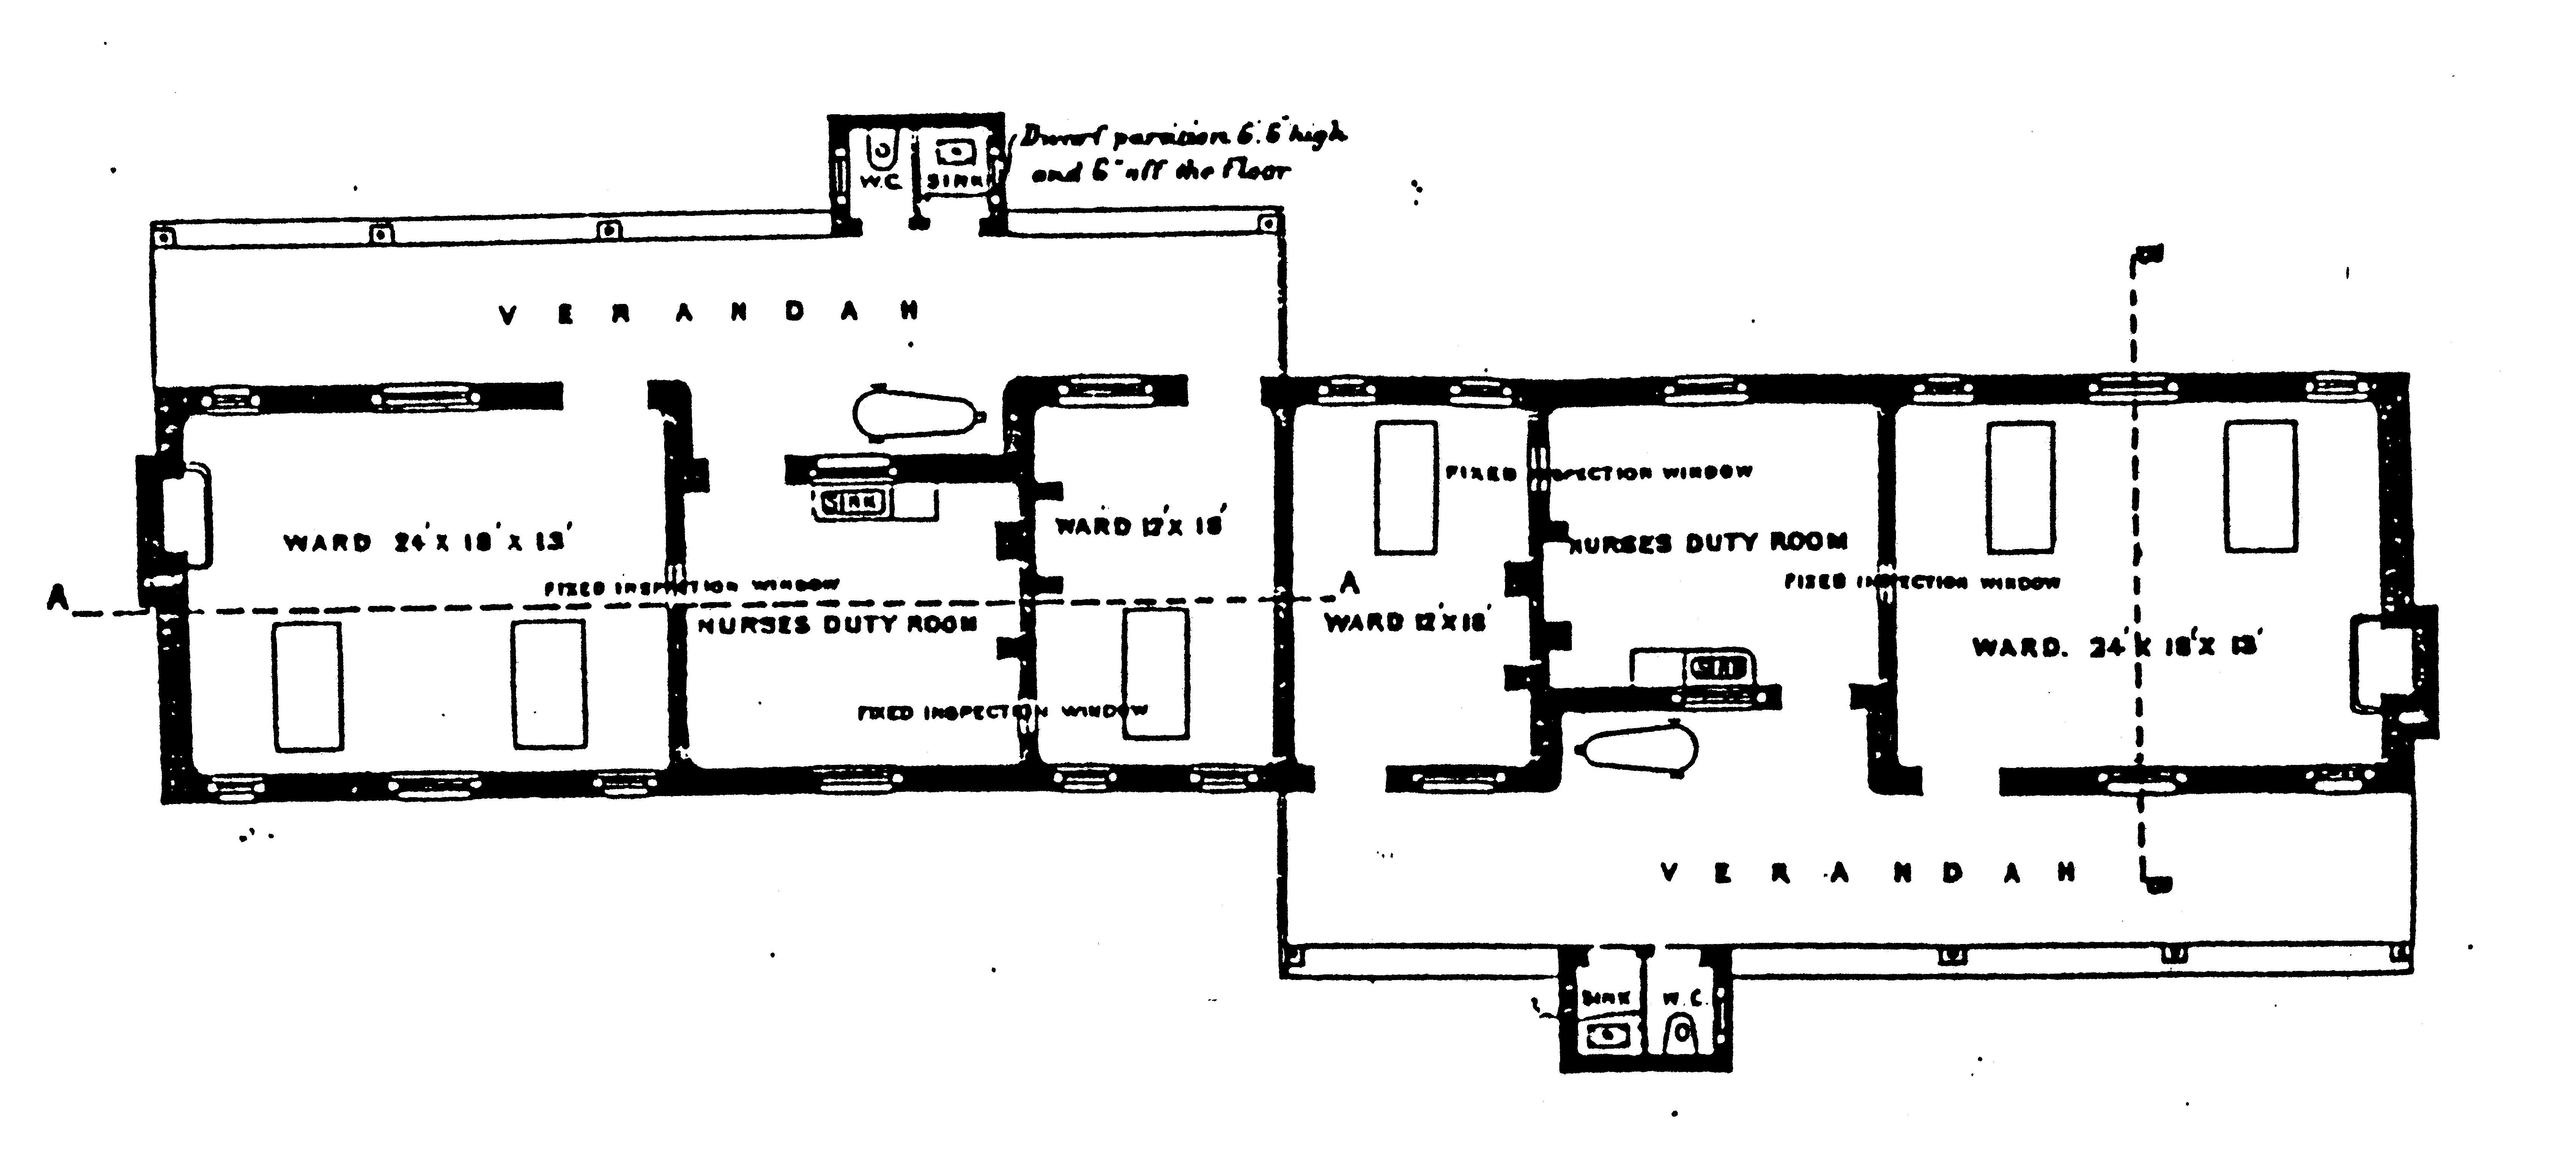 Small Hospital Floor Plans